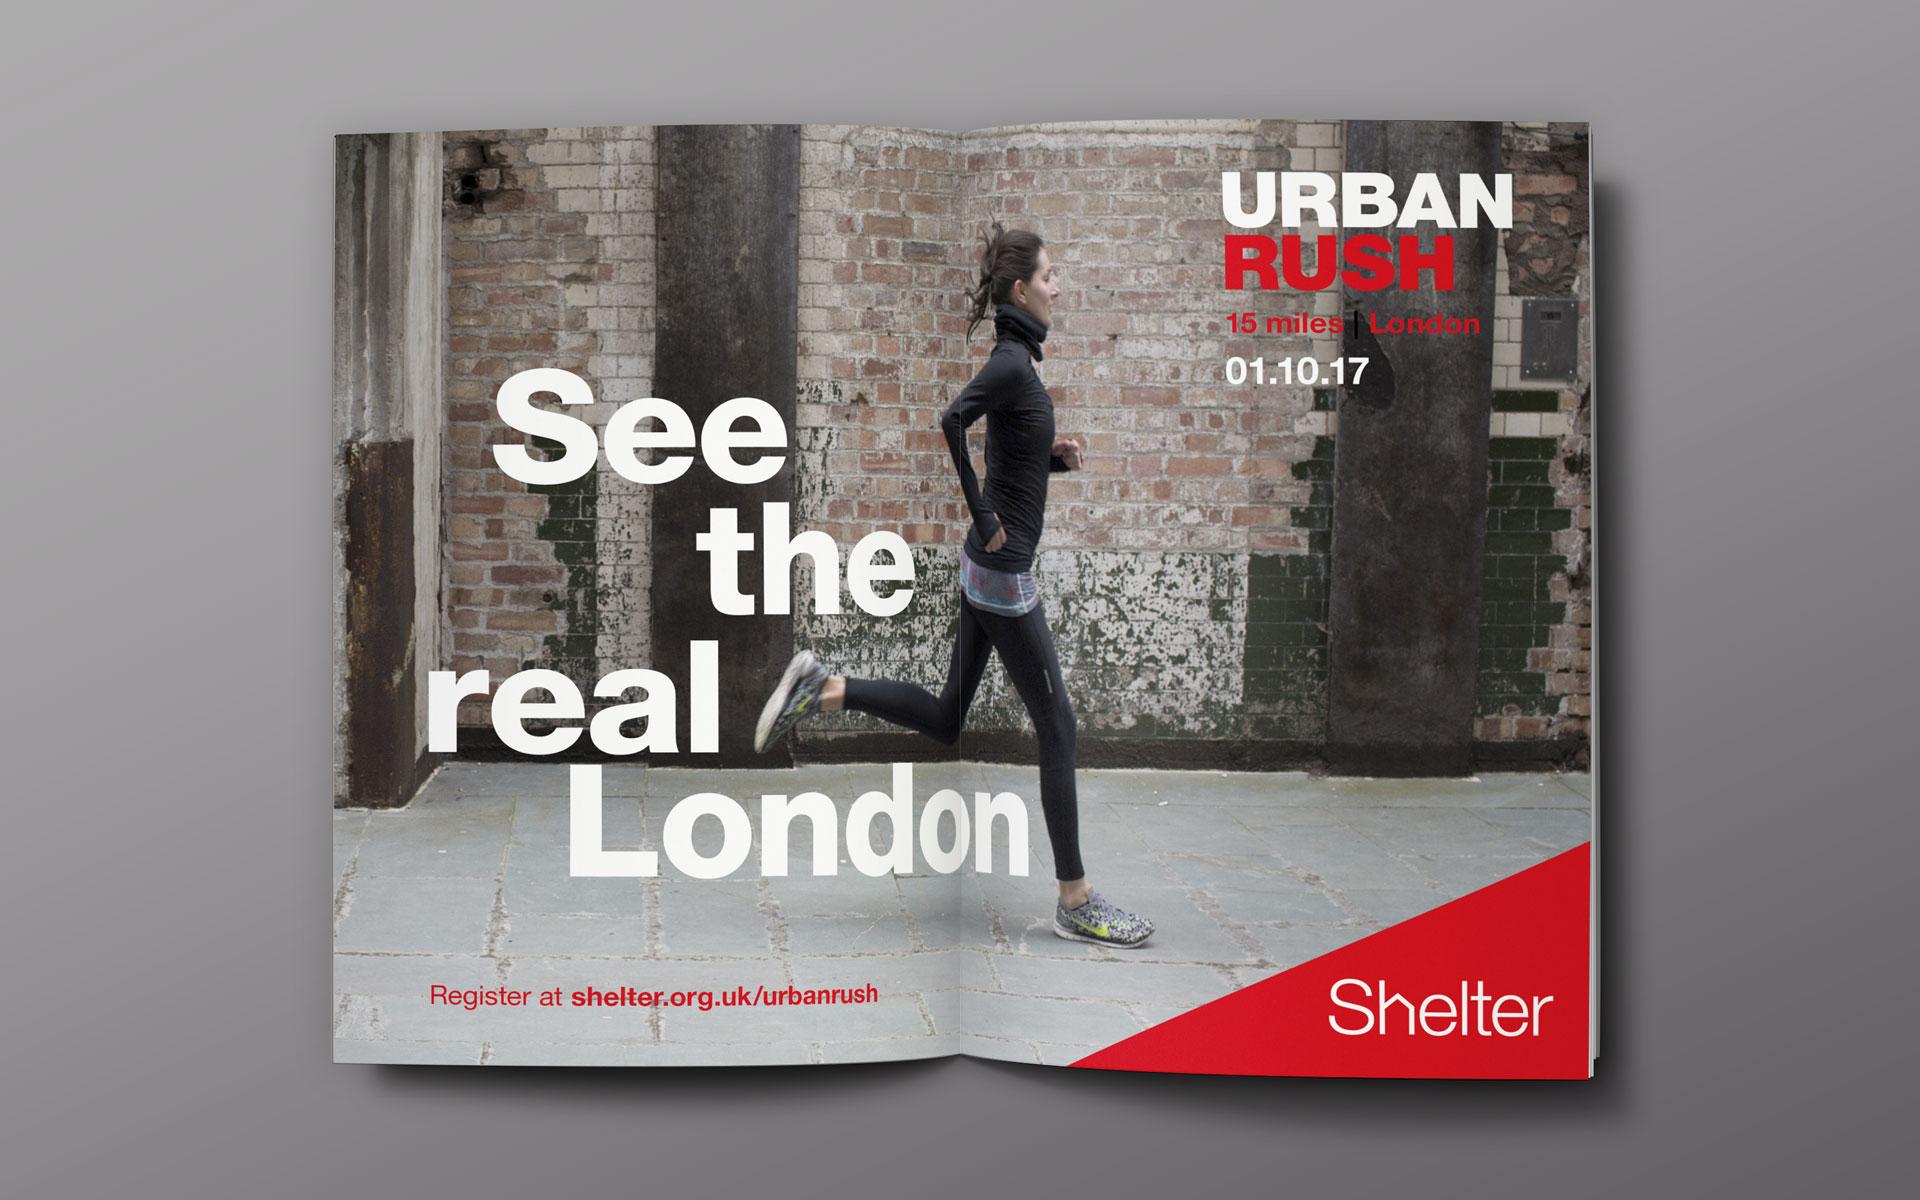 Shelter-Rush_image1